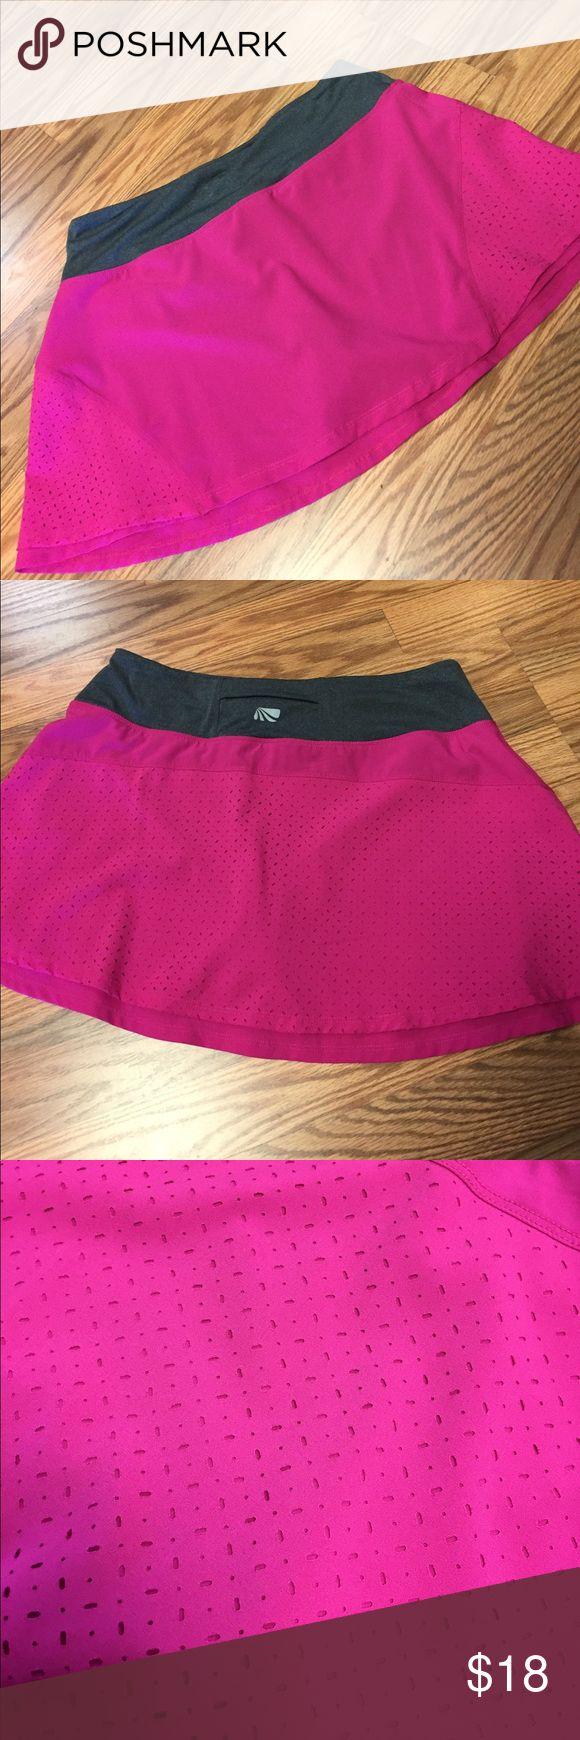 Marika Pink and gray athletic skort Marika Skirts